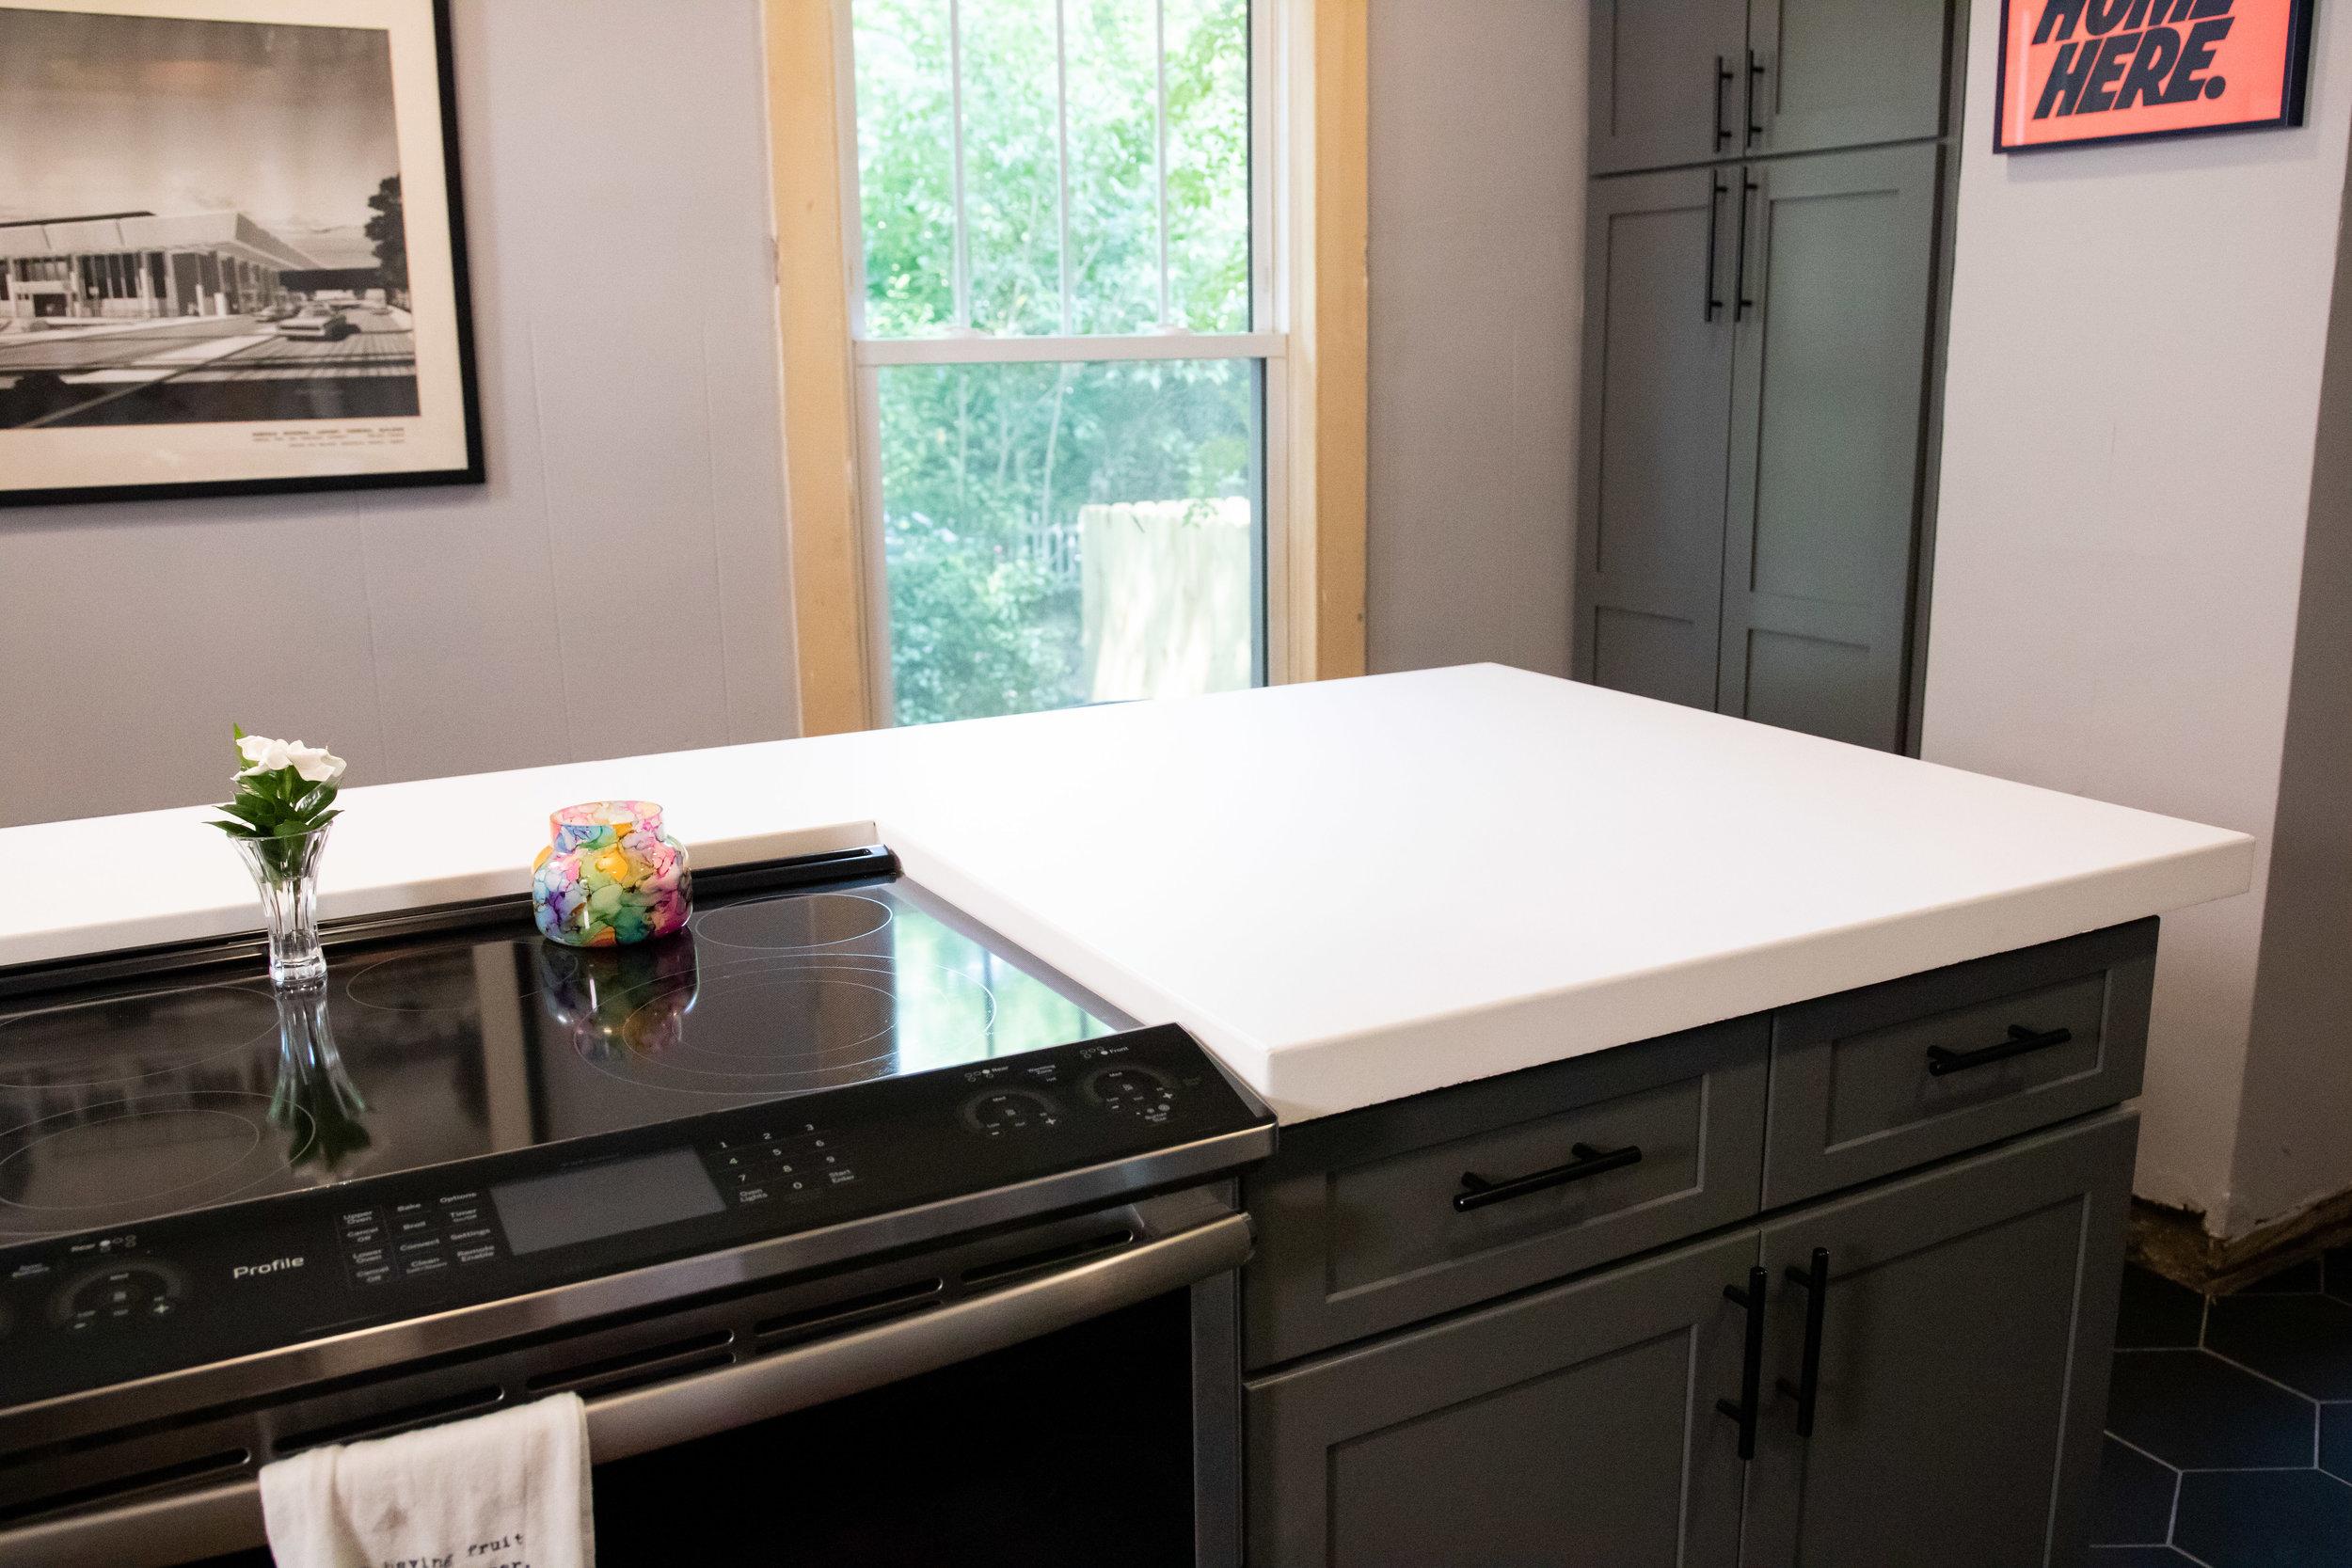 5300-countertop-kitchen-9.jpg